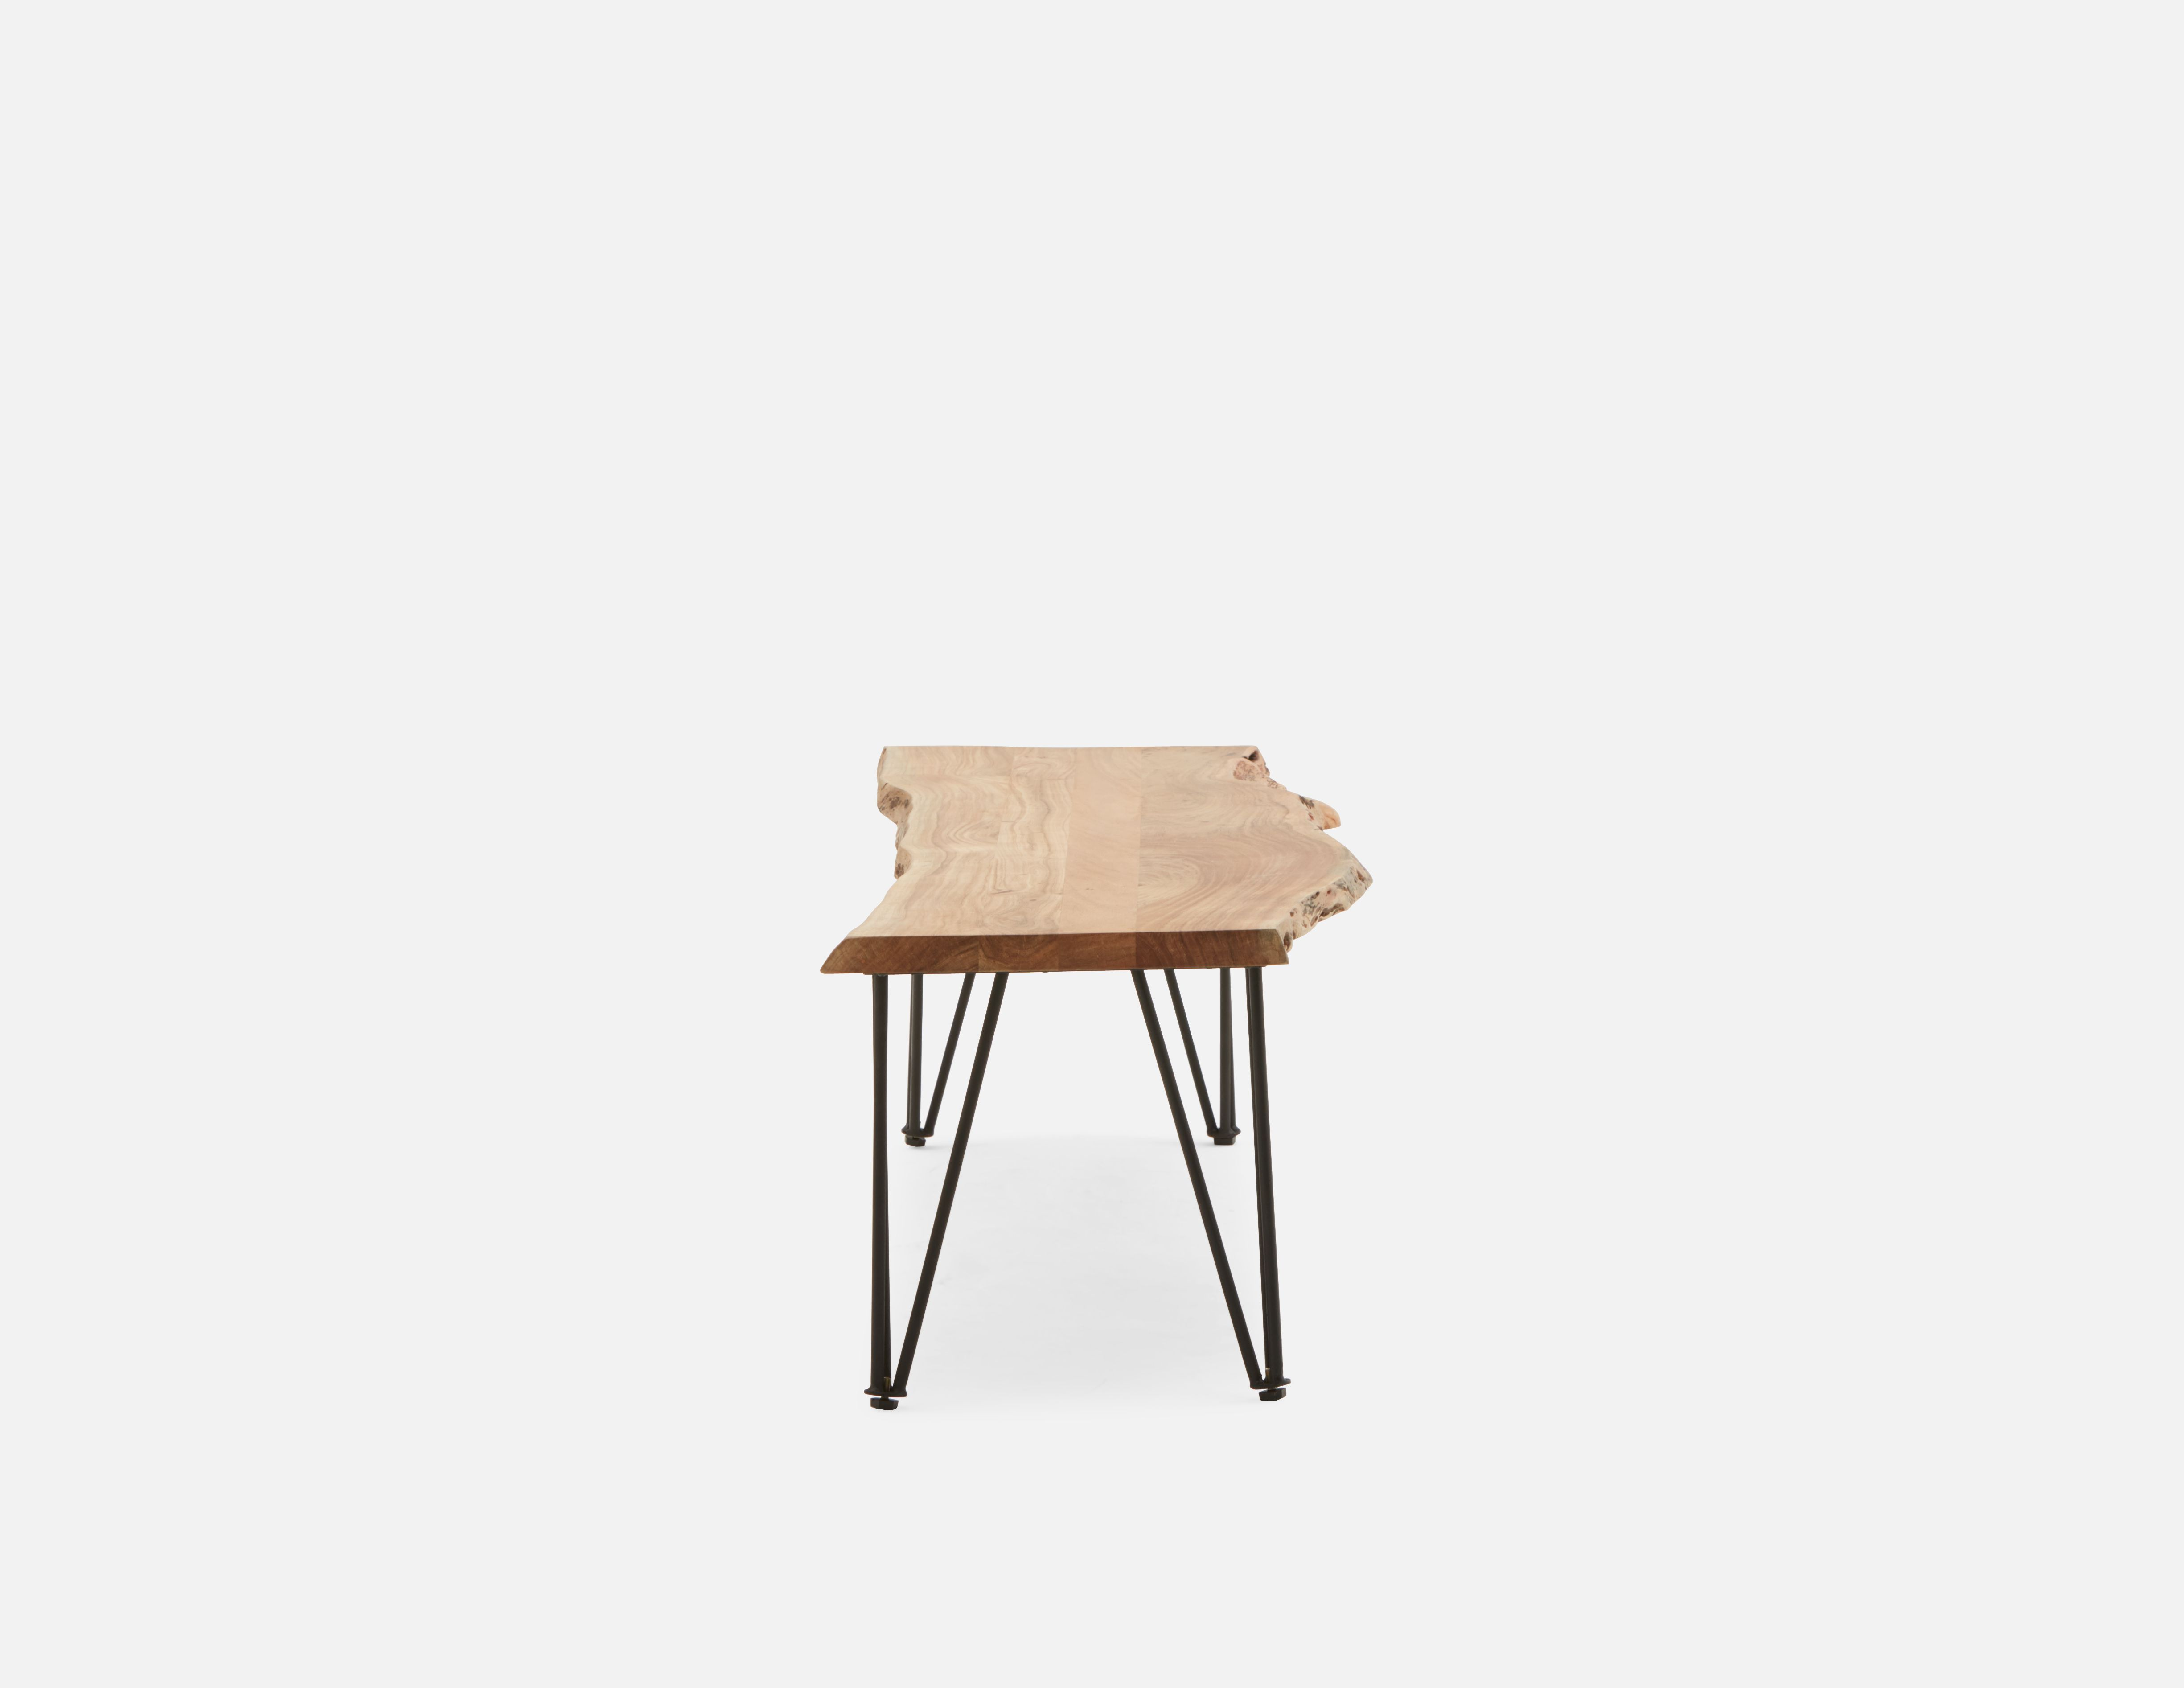 Solid Acacia Wood Bench Struc